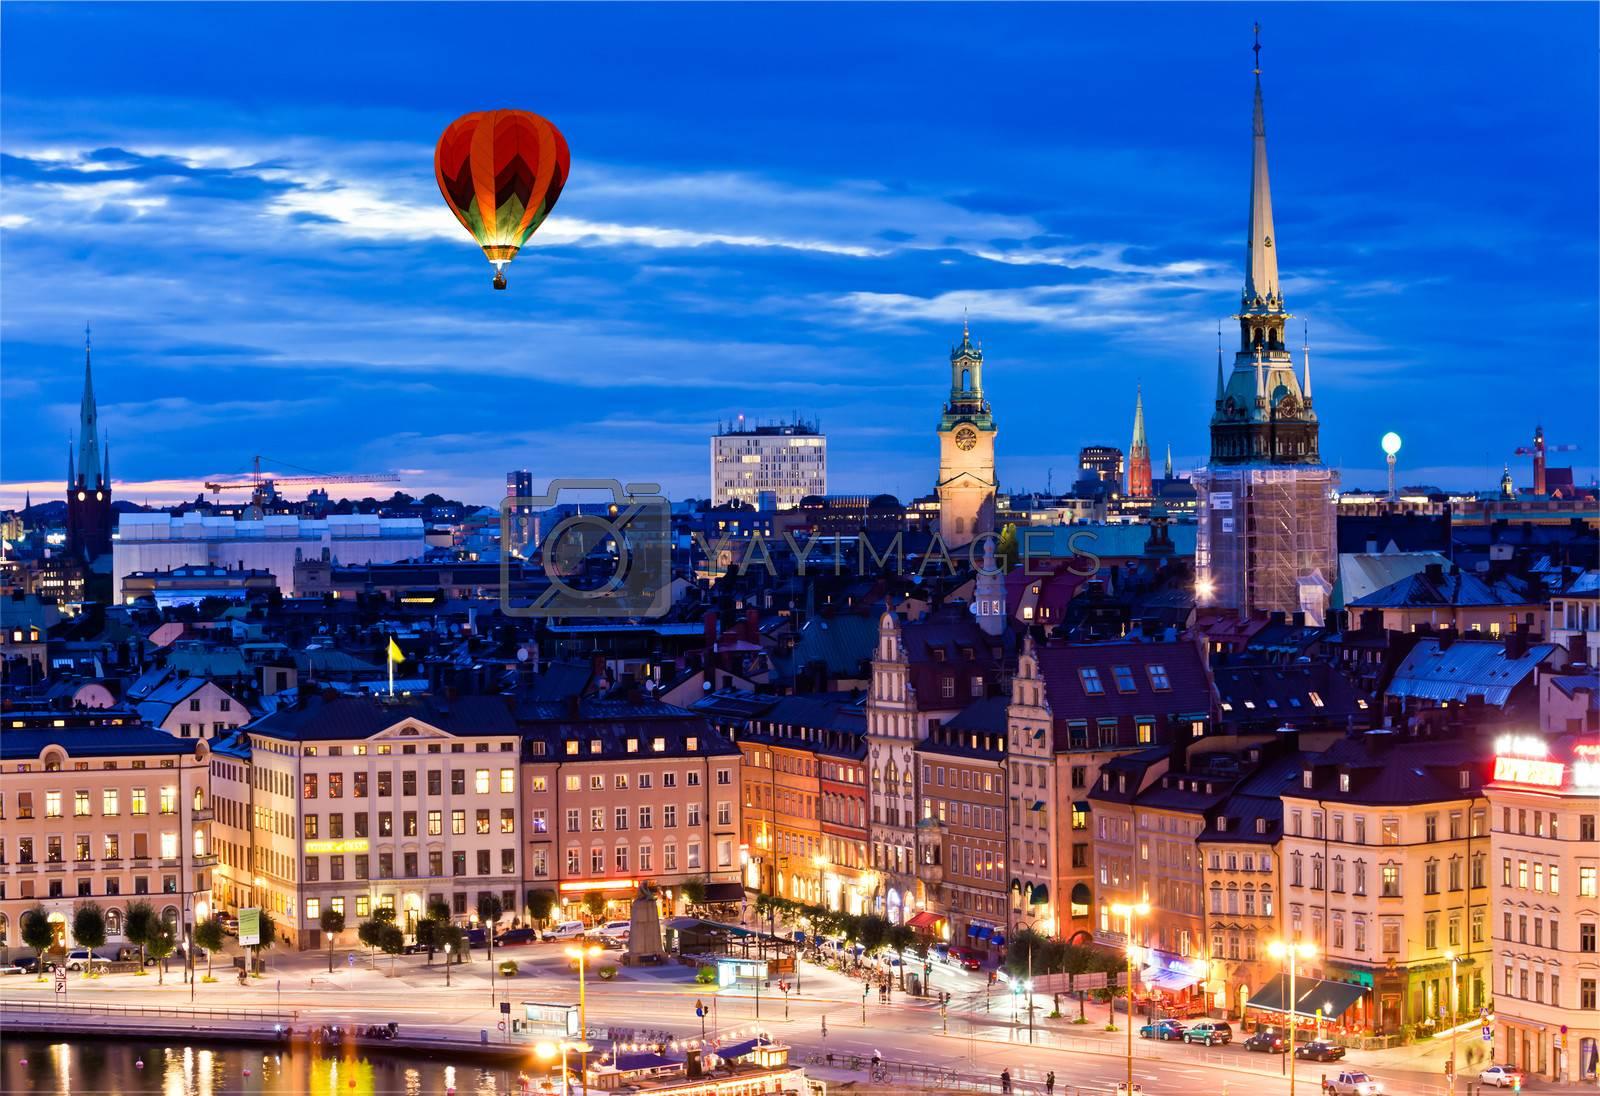 Night scene of the Stockholm City at top of Katarina elevator